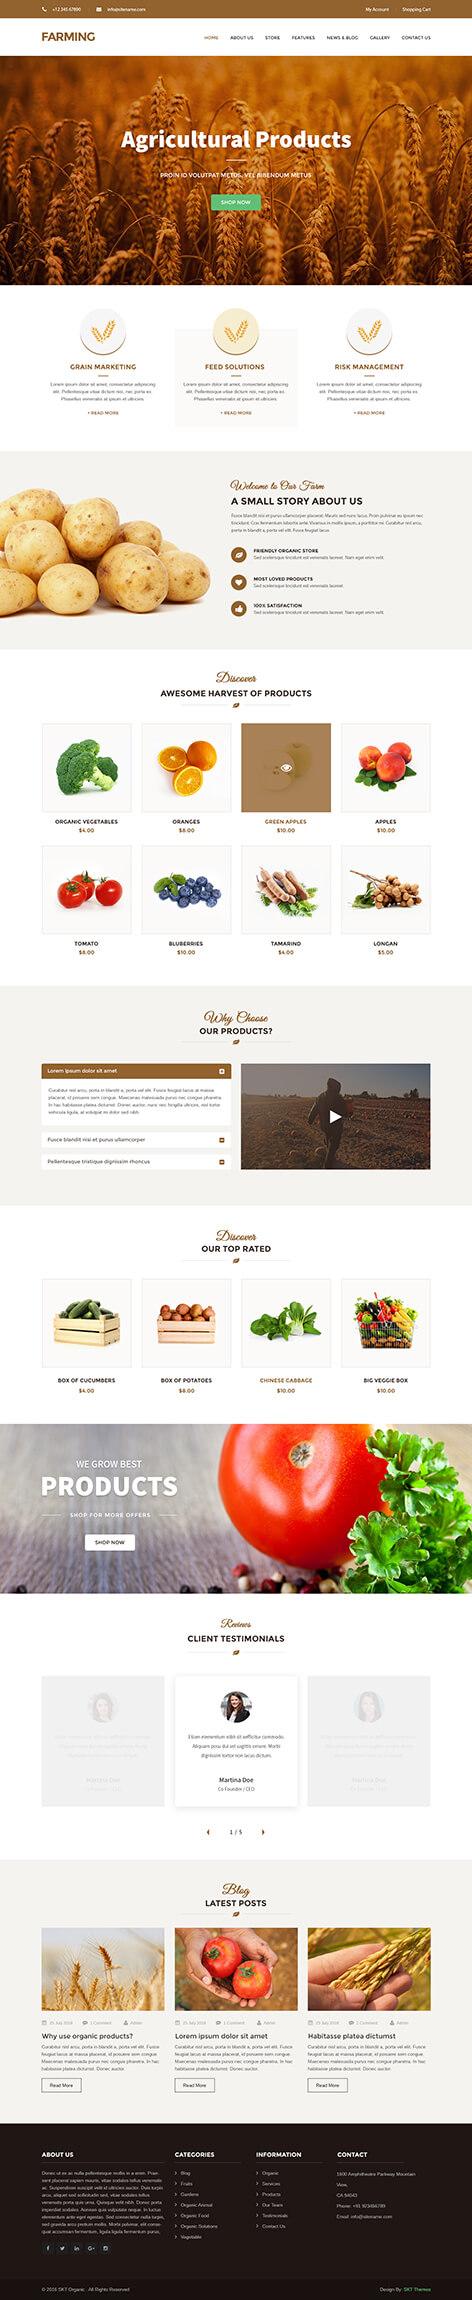 organic food wordpress theme1 - Farming